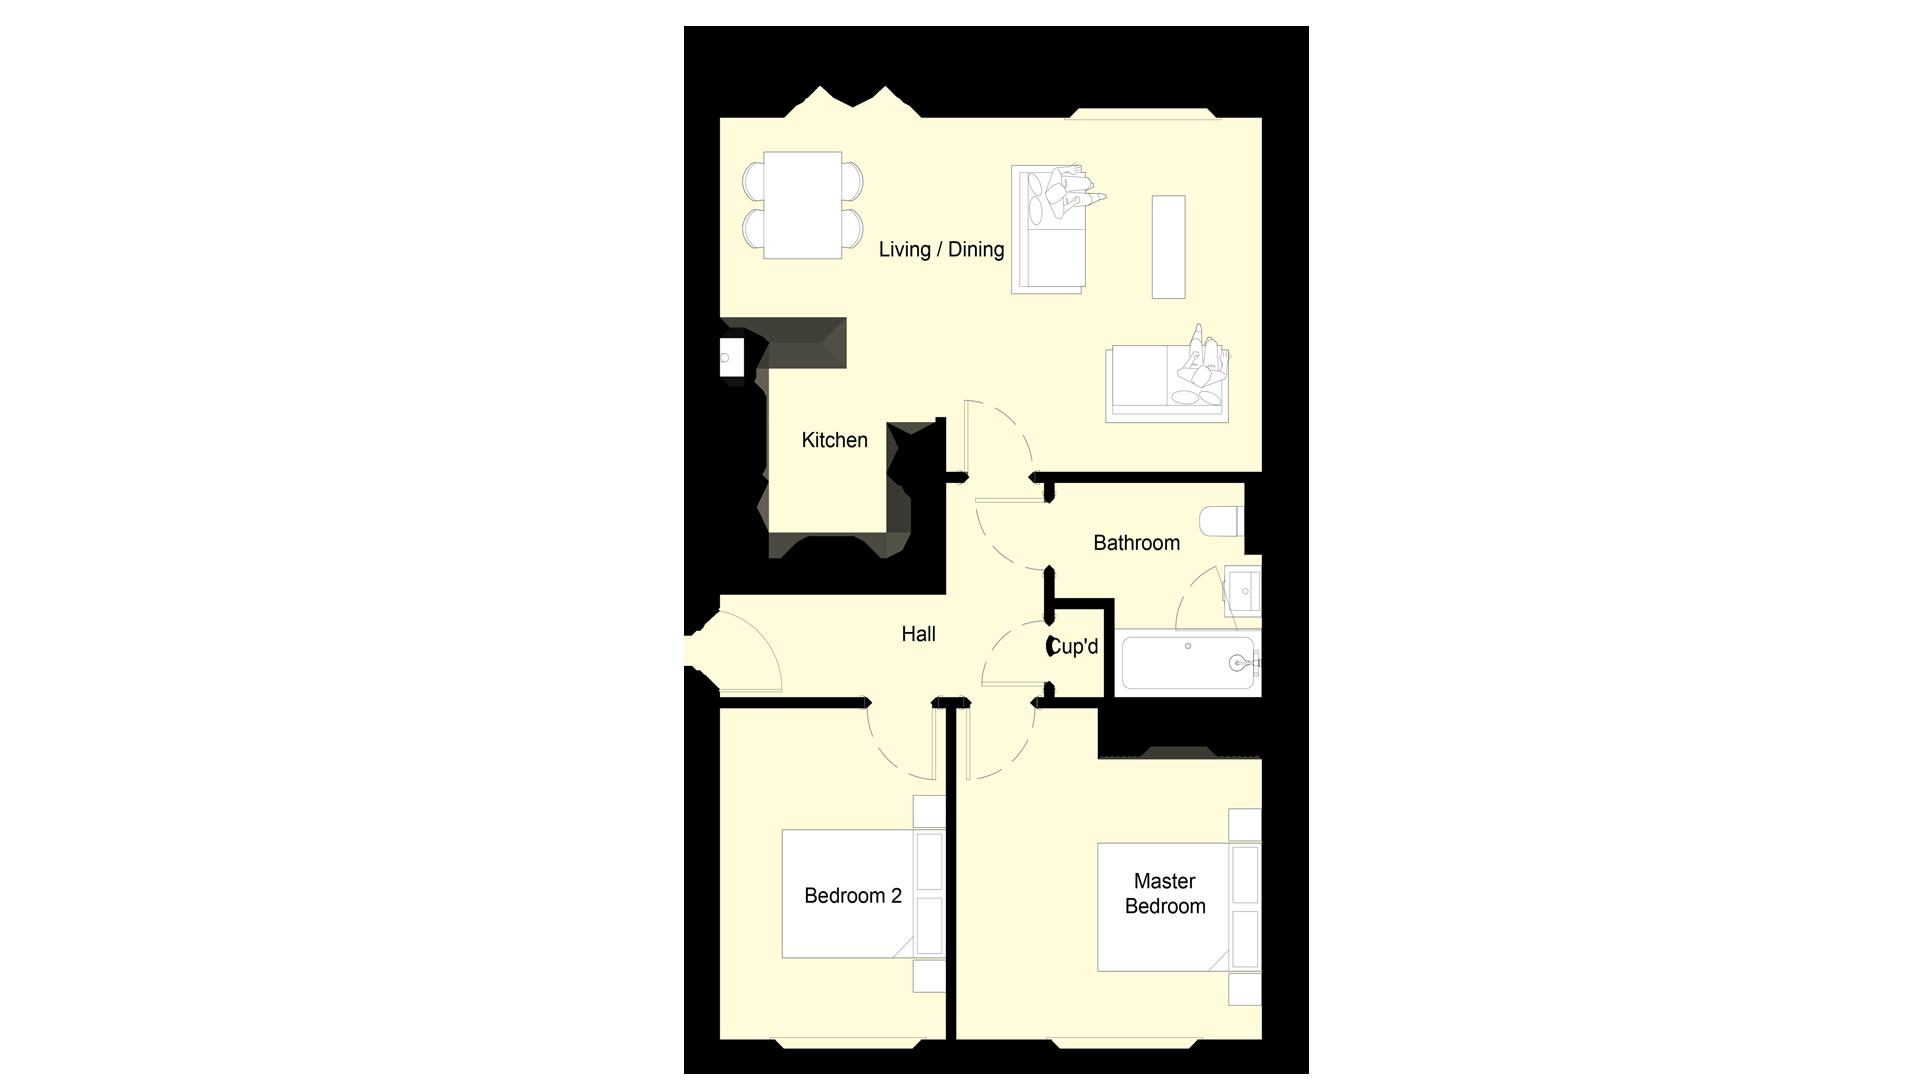 Layout of Ground floor Plot 1 Phase 2 Churchfields